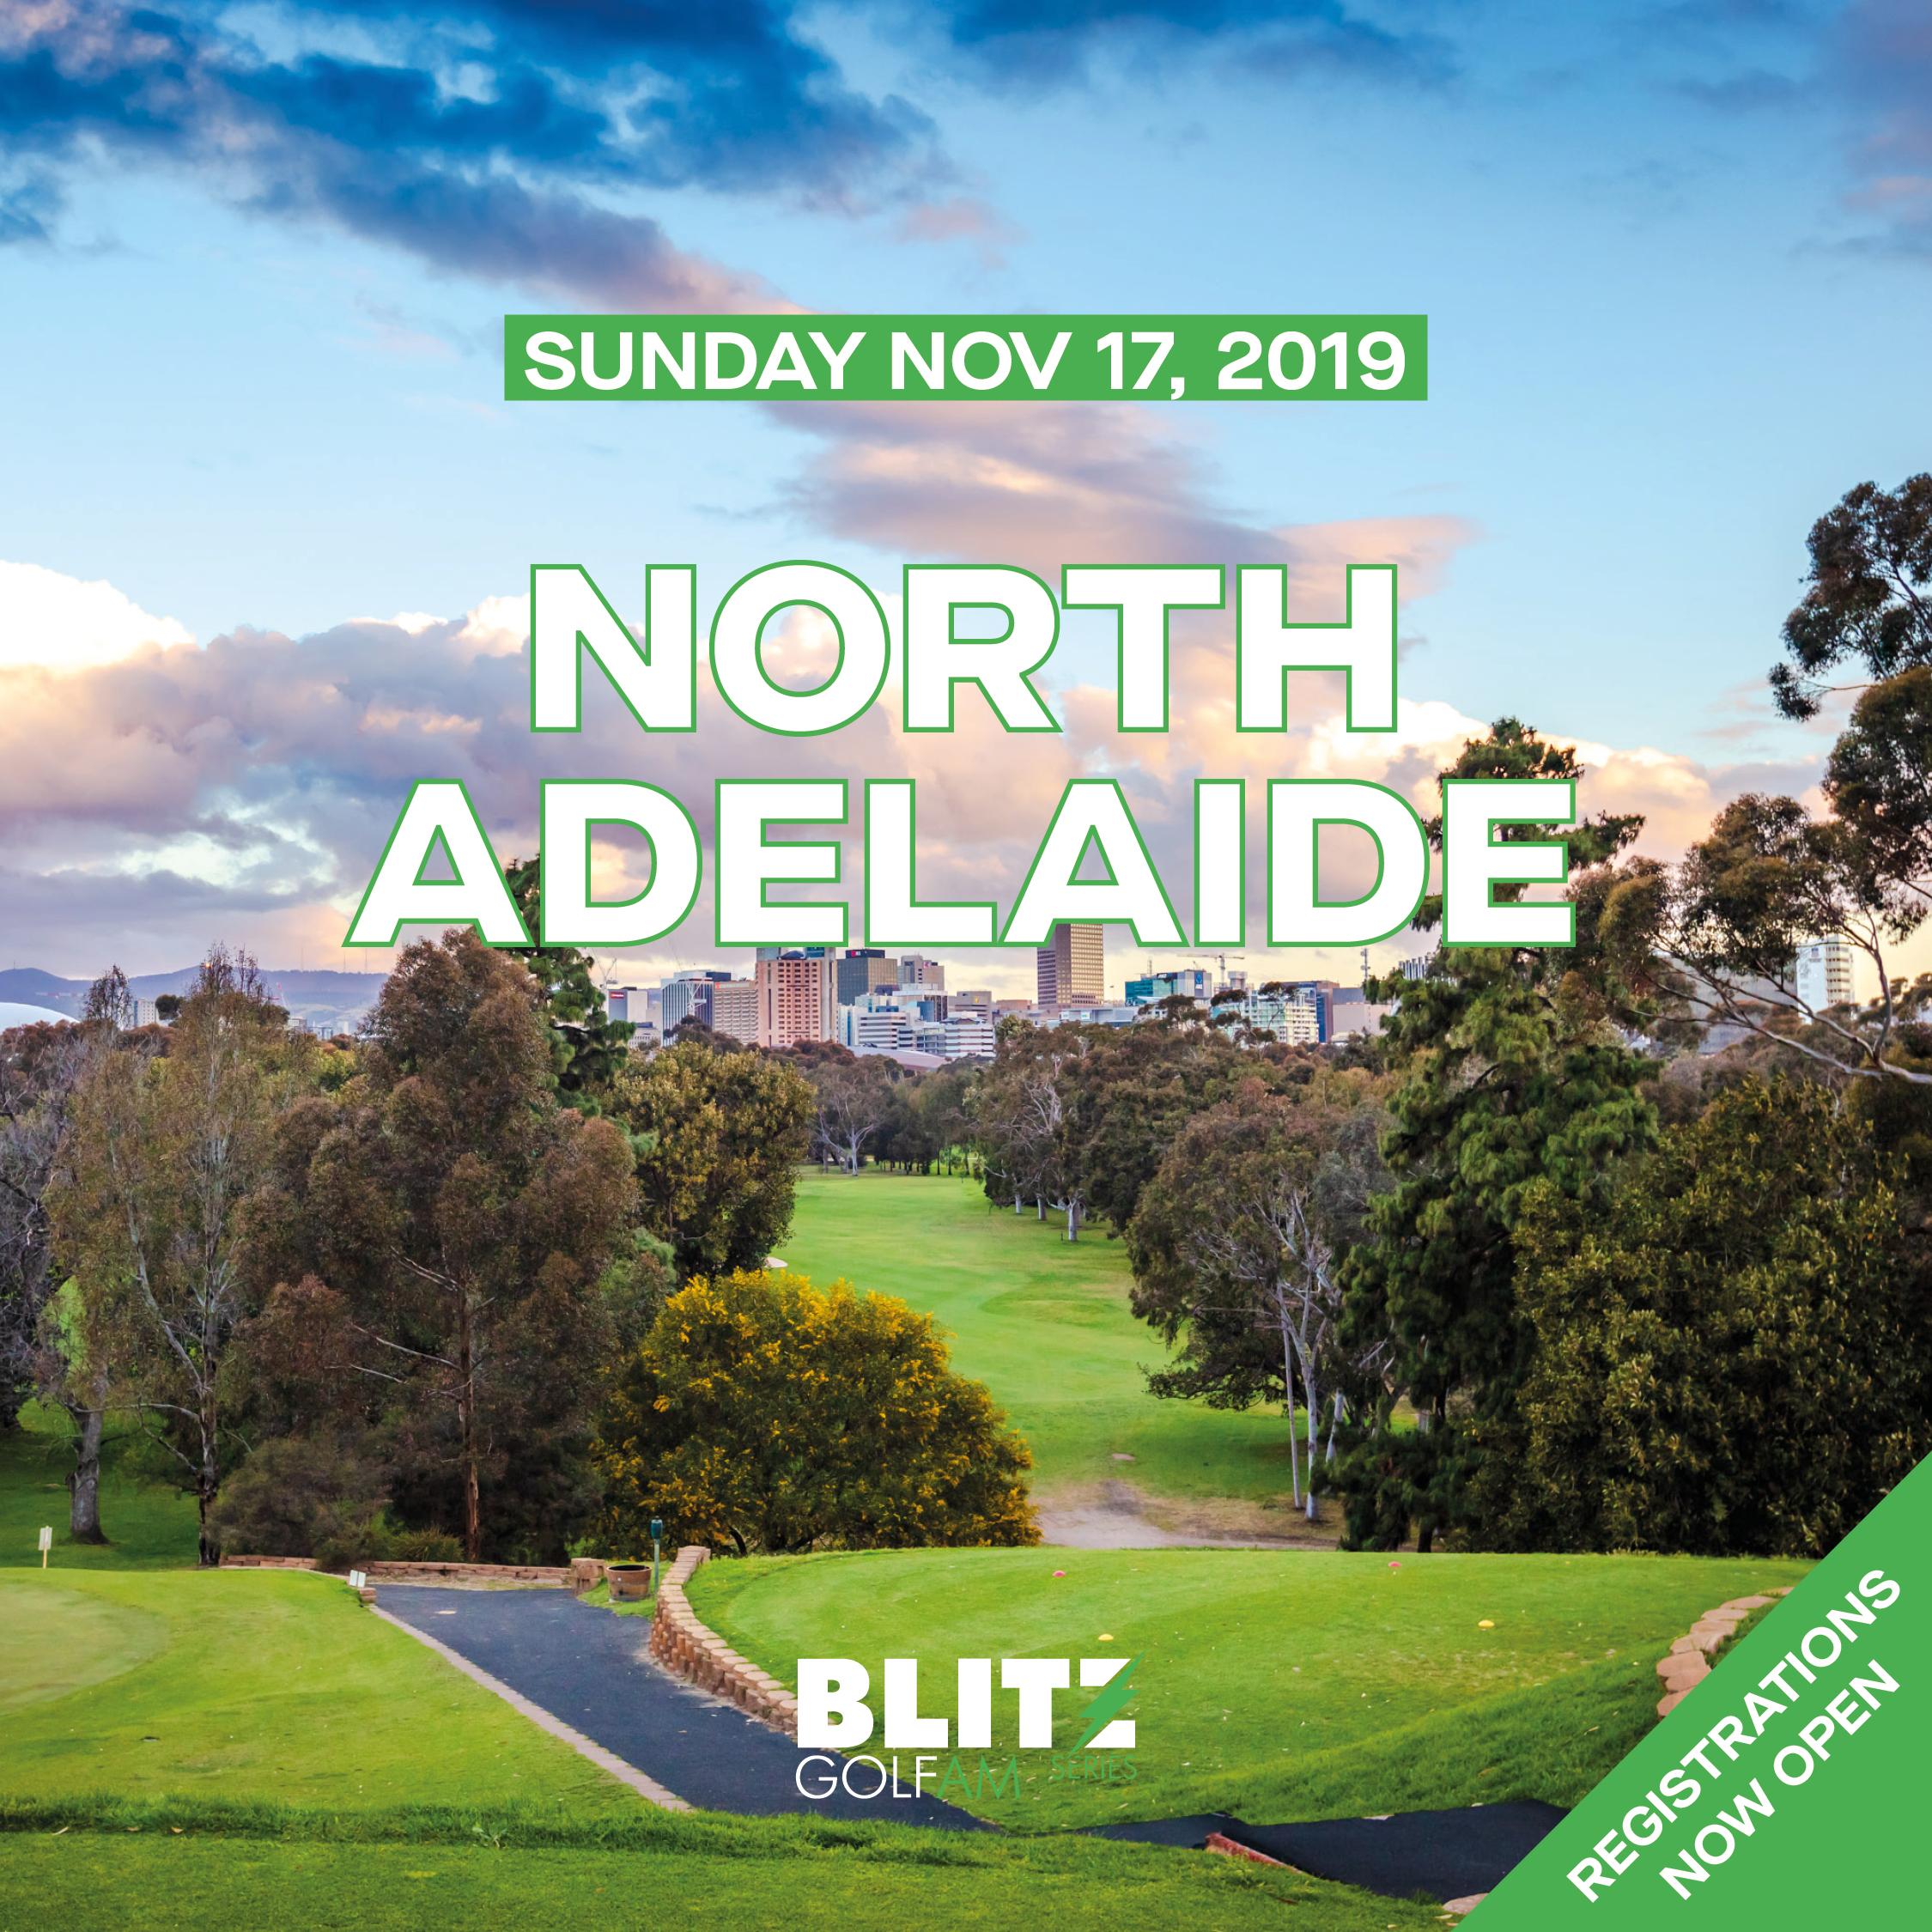 SANT_North Adelaide_Blitz 2020_AM Series Launch_171119.jpg